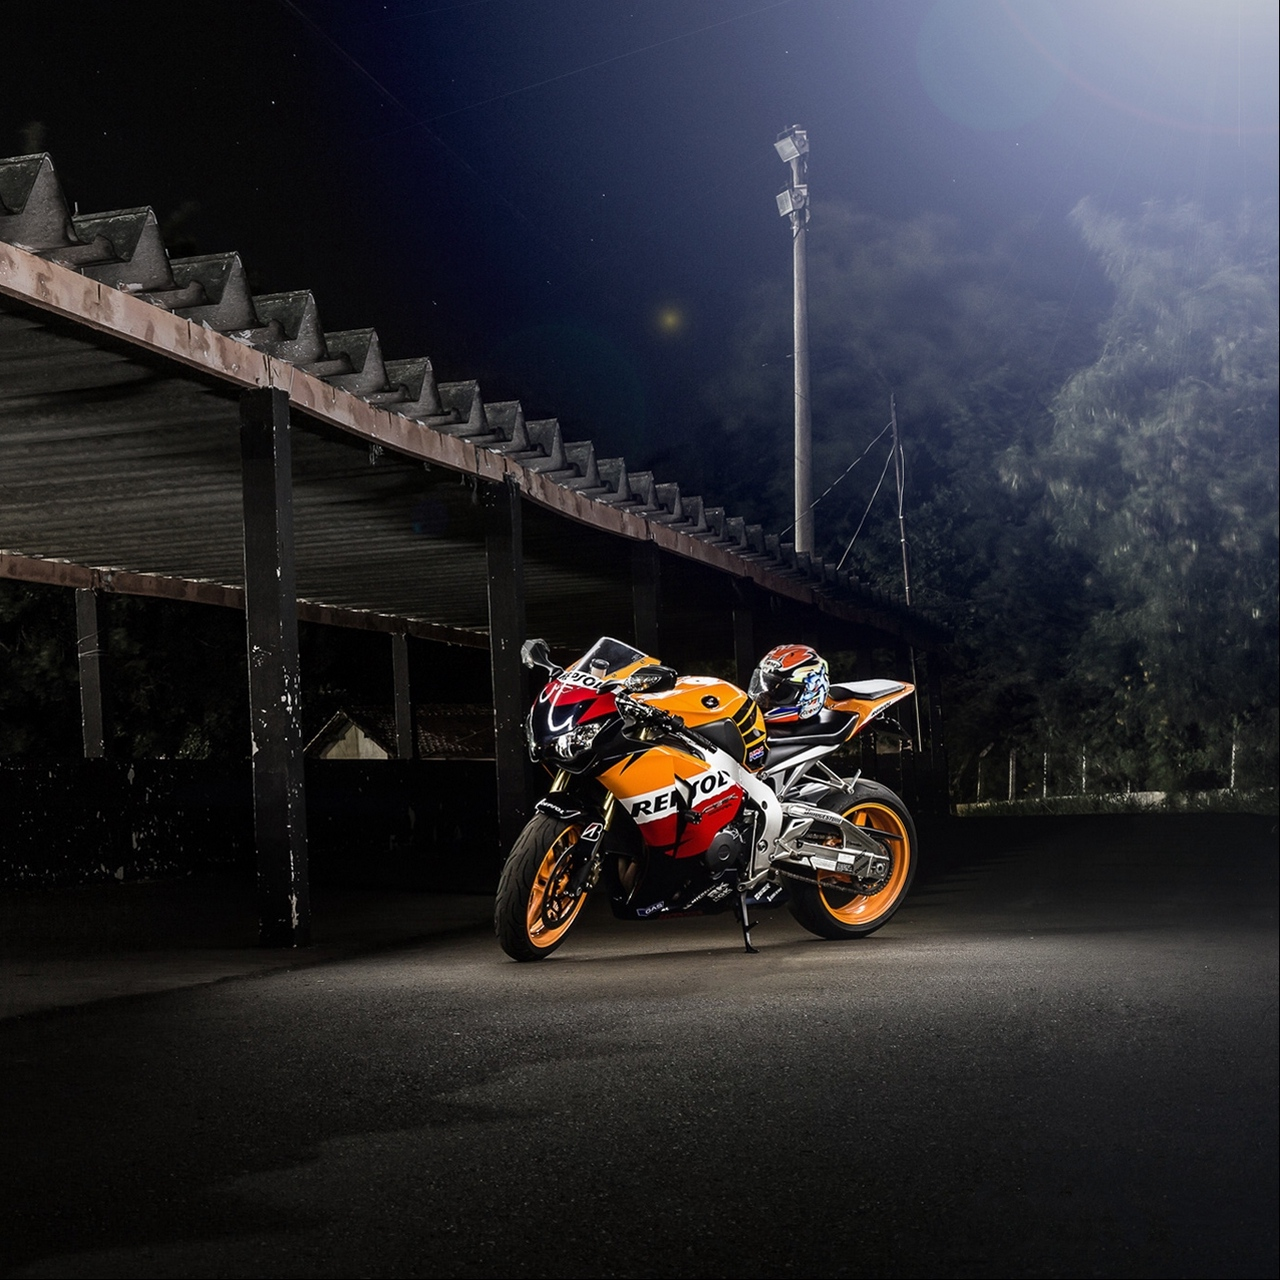 Download wallpaper 1280x1280 honda cbr1000rr repsol motorcycle 1280x1280